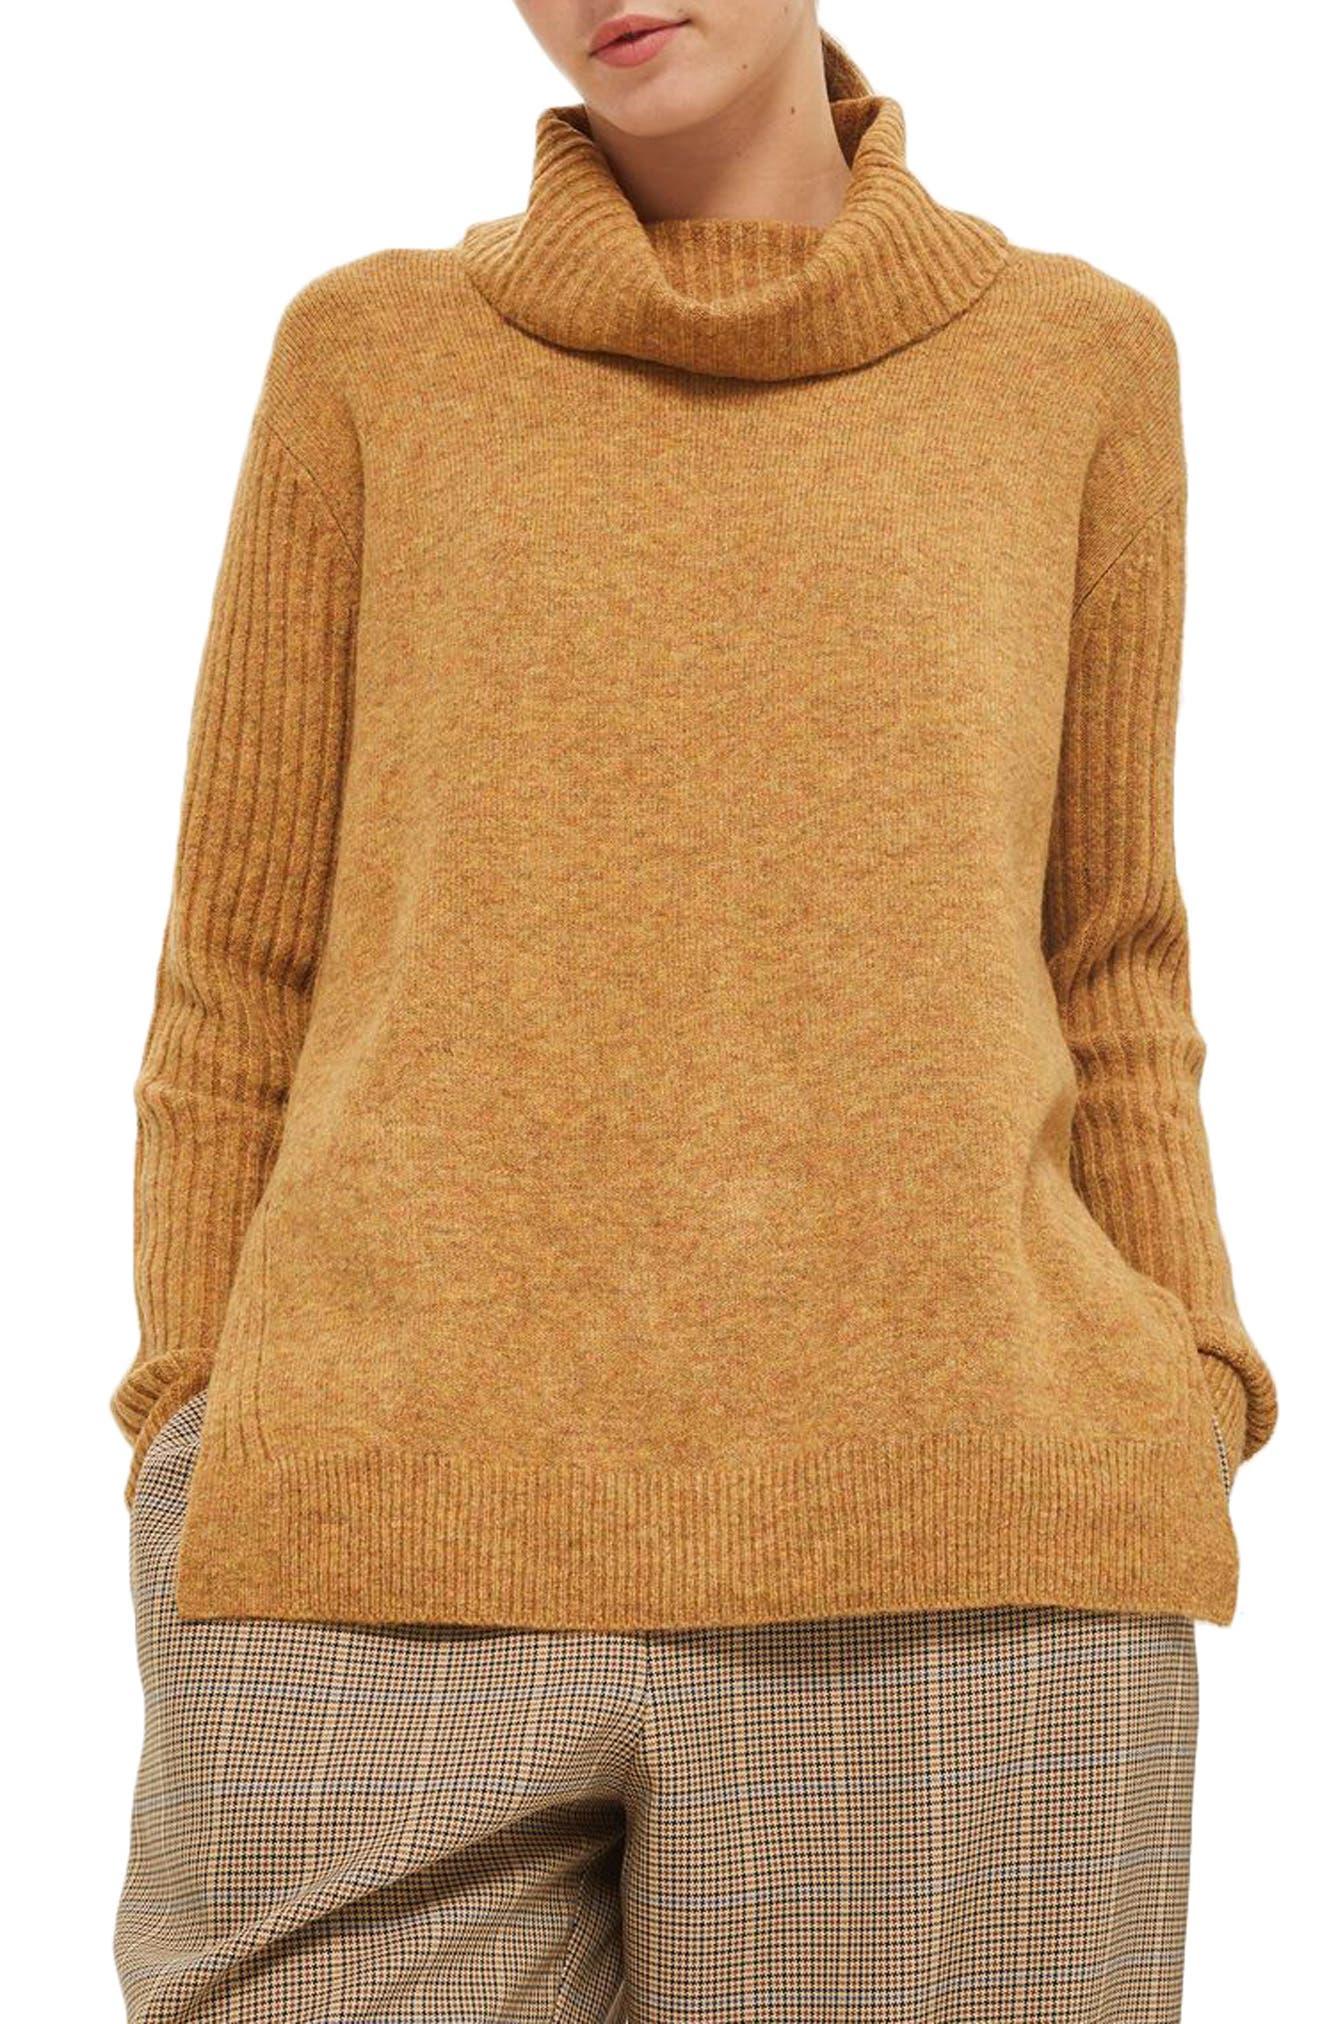 TOPSHOP, Oversize Turtleneck Sweater, Main thumbnail 1, color, 701